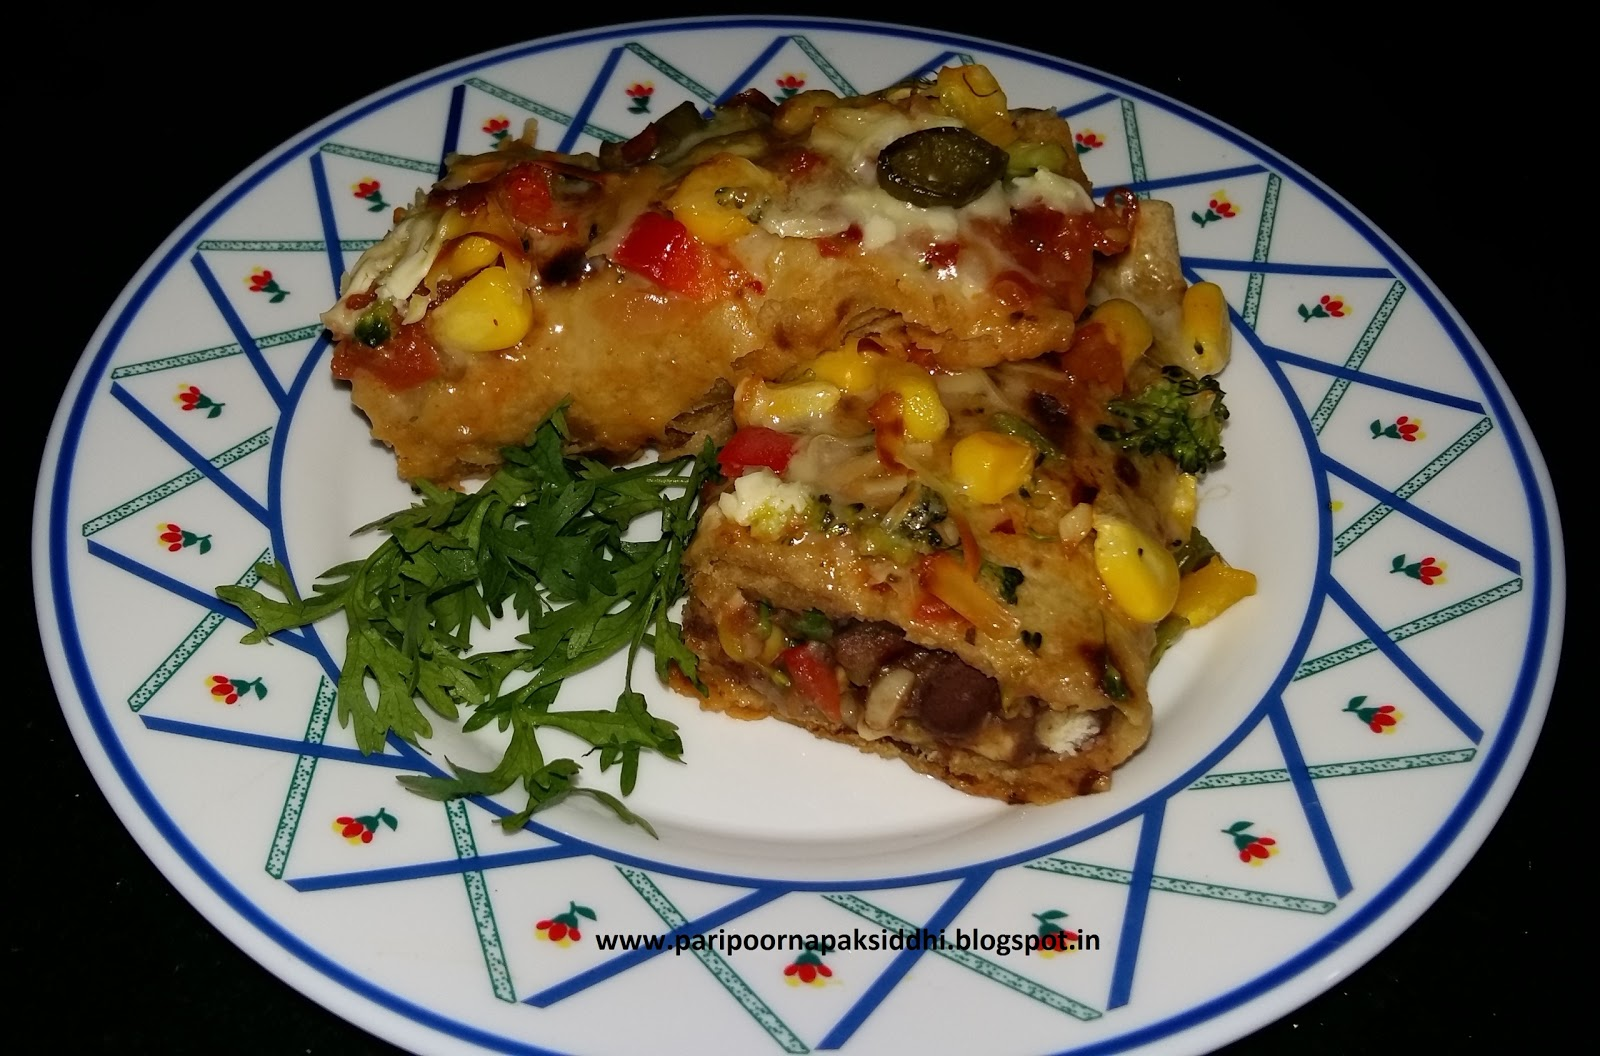 10 Best Vegetarian Mexican Enchiladas Recipes - Yummly